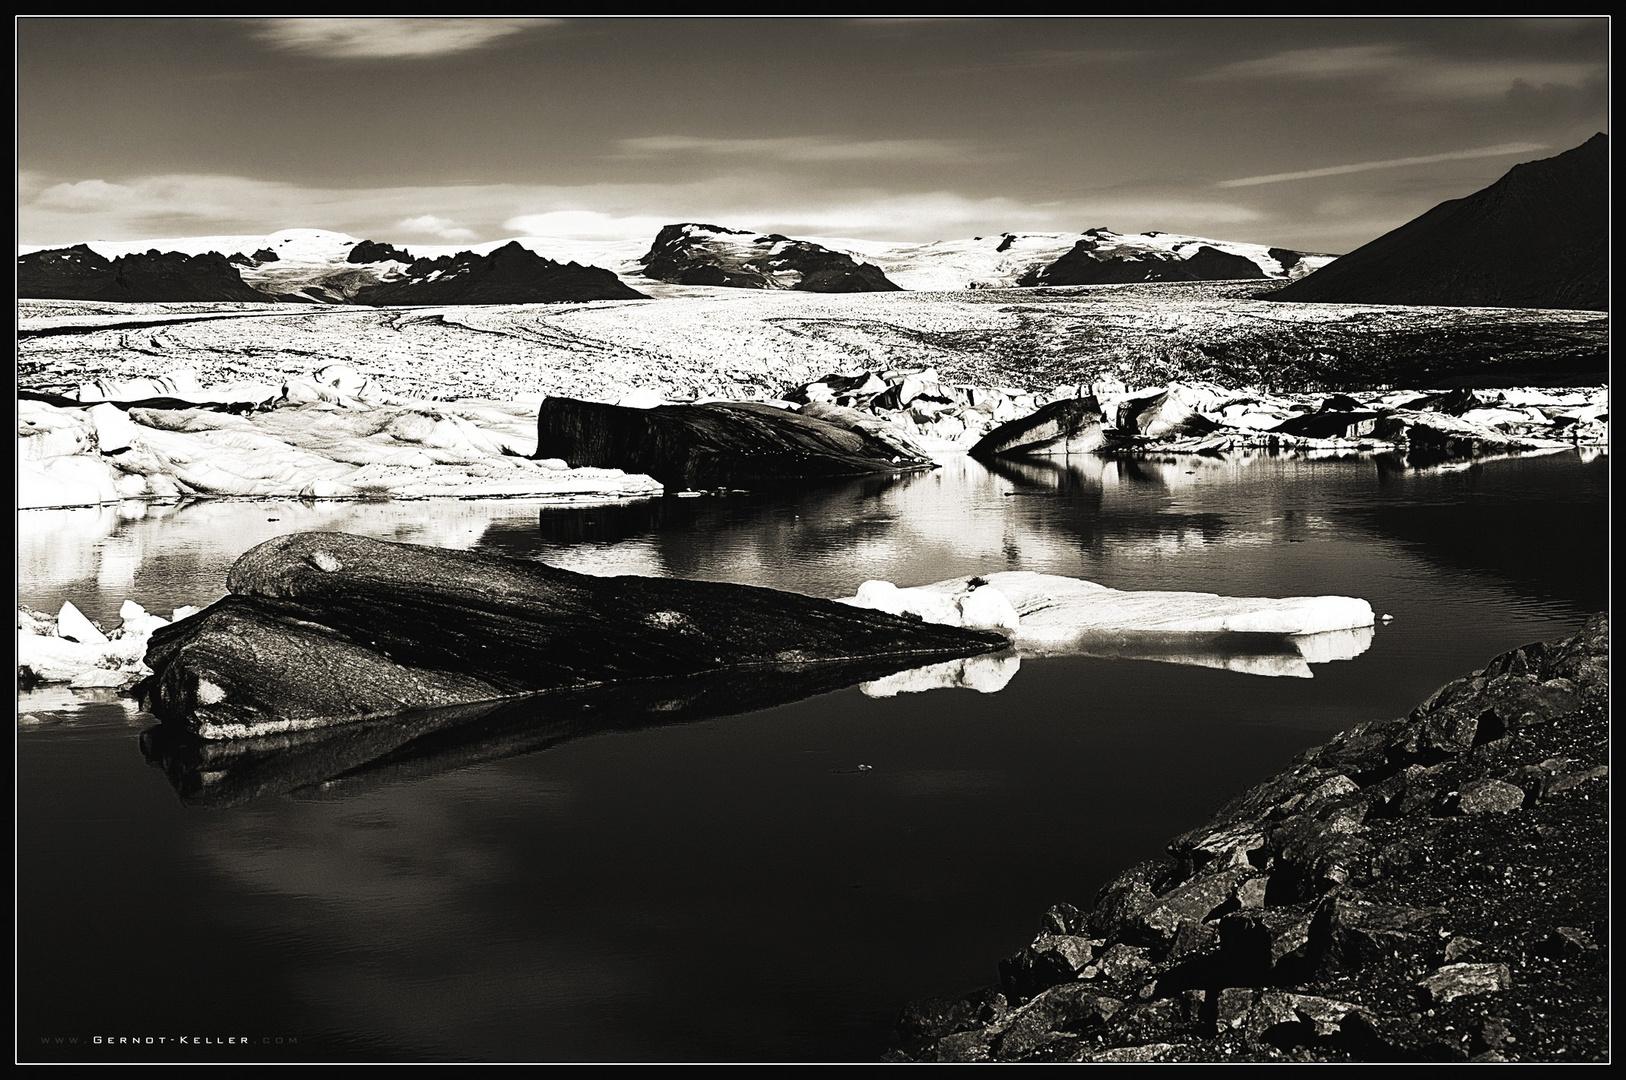 08682 - Iceland, Joekullsarlon